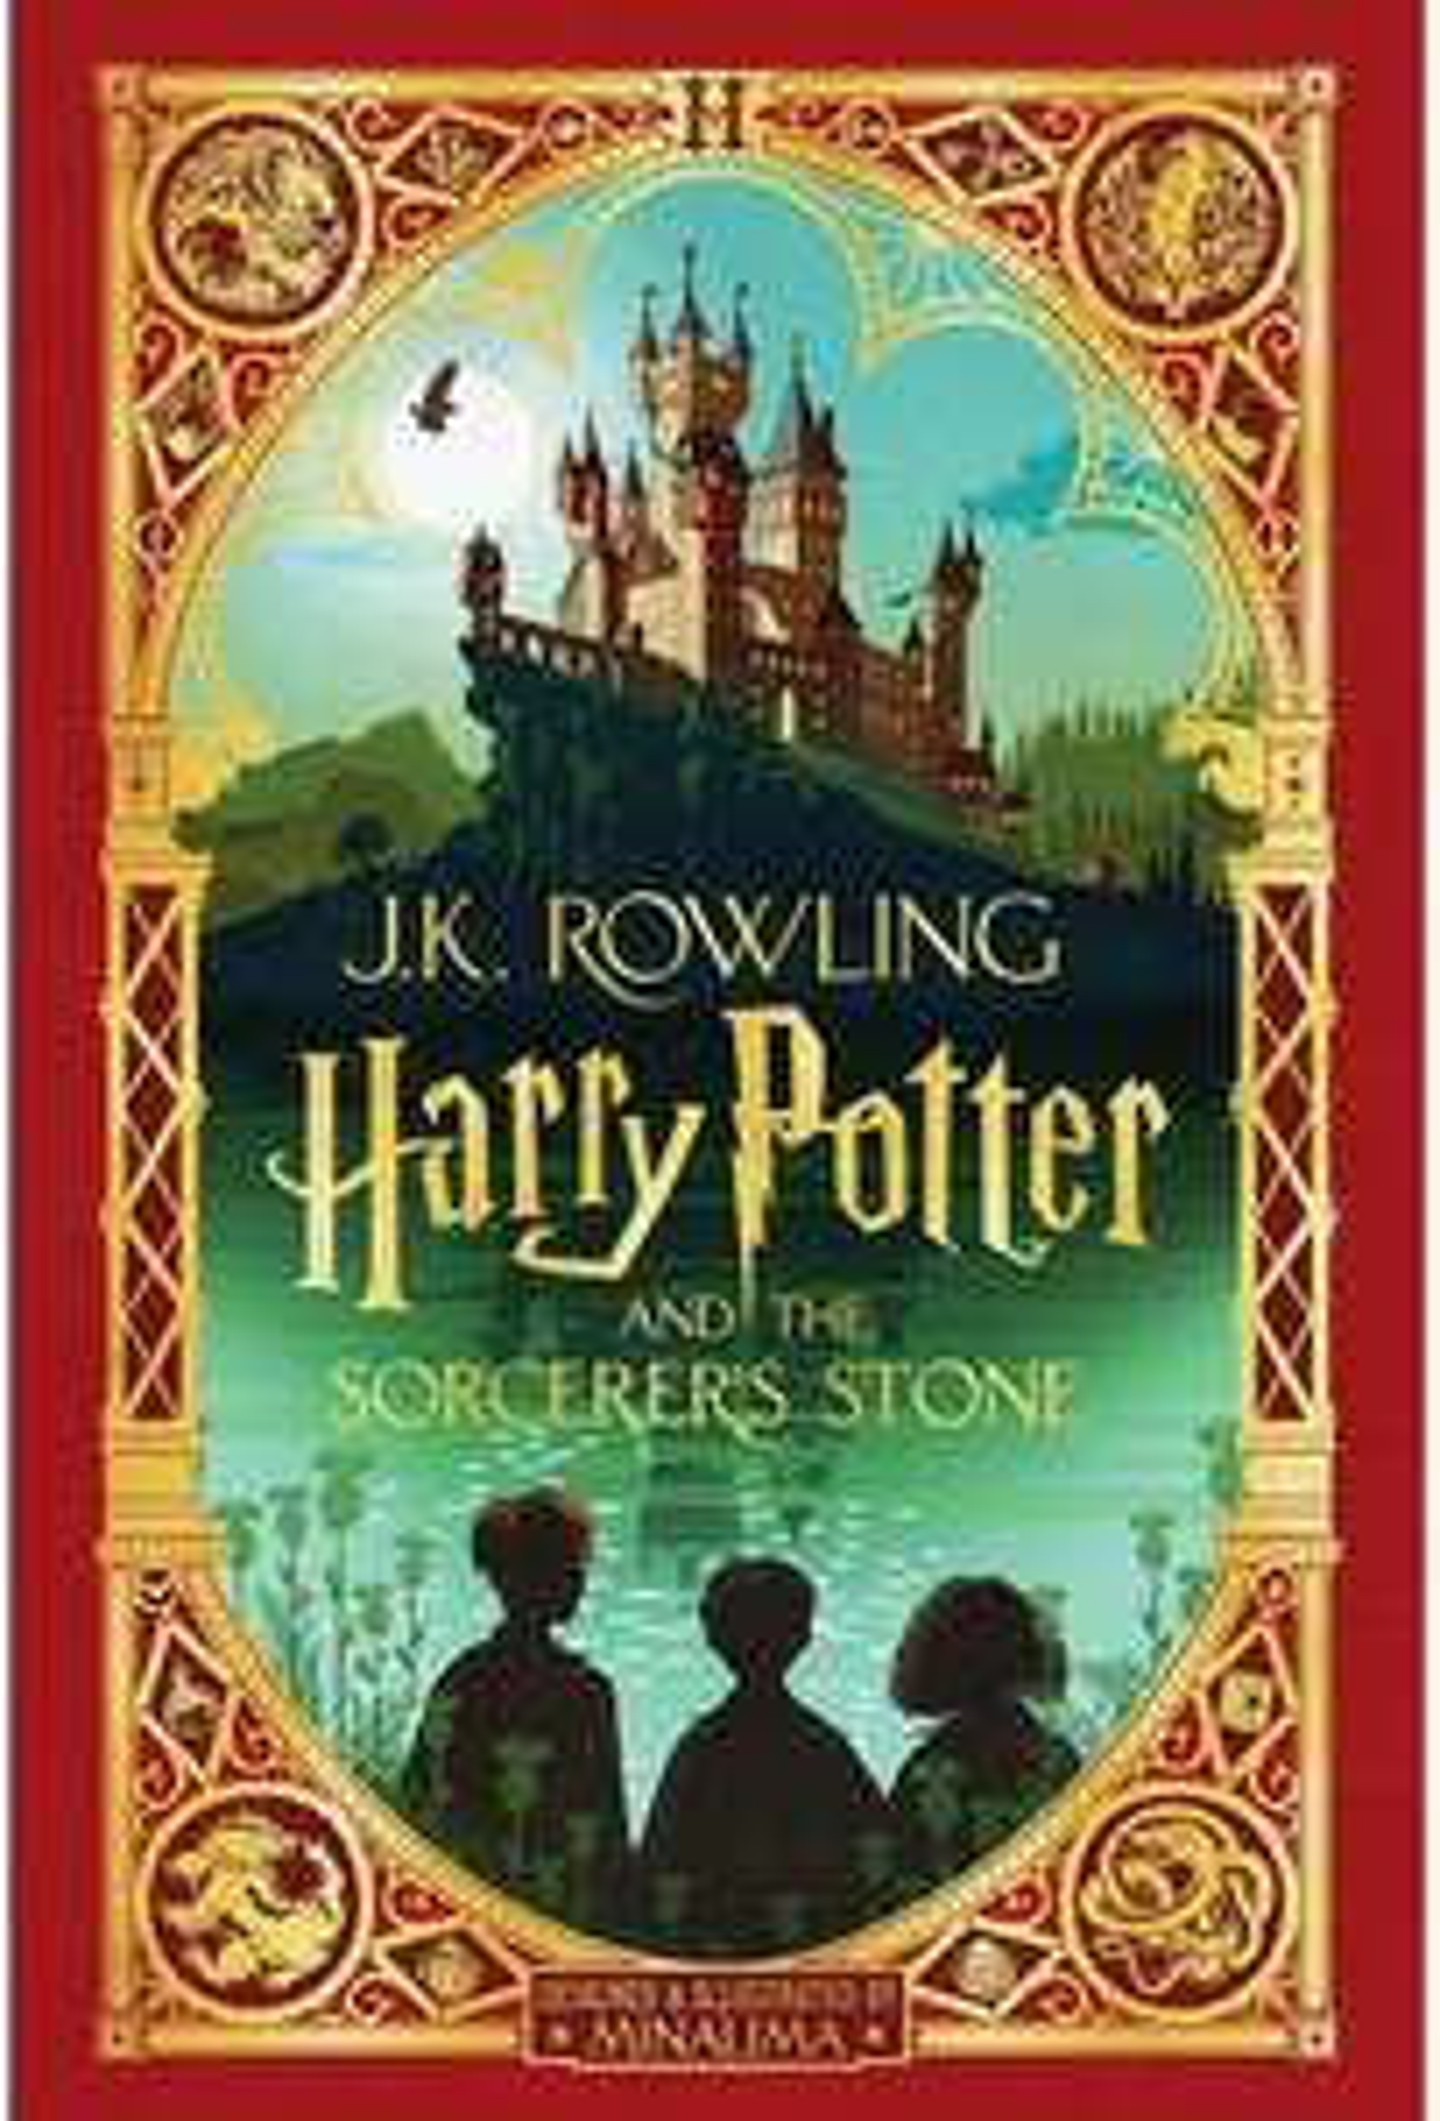 Amazon: Harry Potter and the Sorcerer's Stone: Minalima Edition